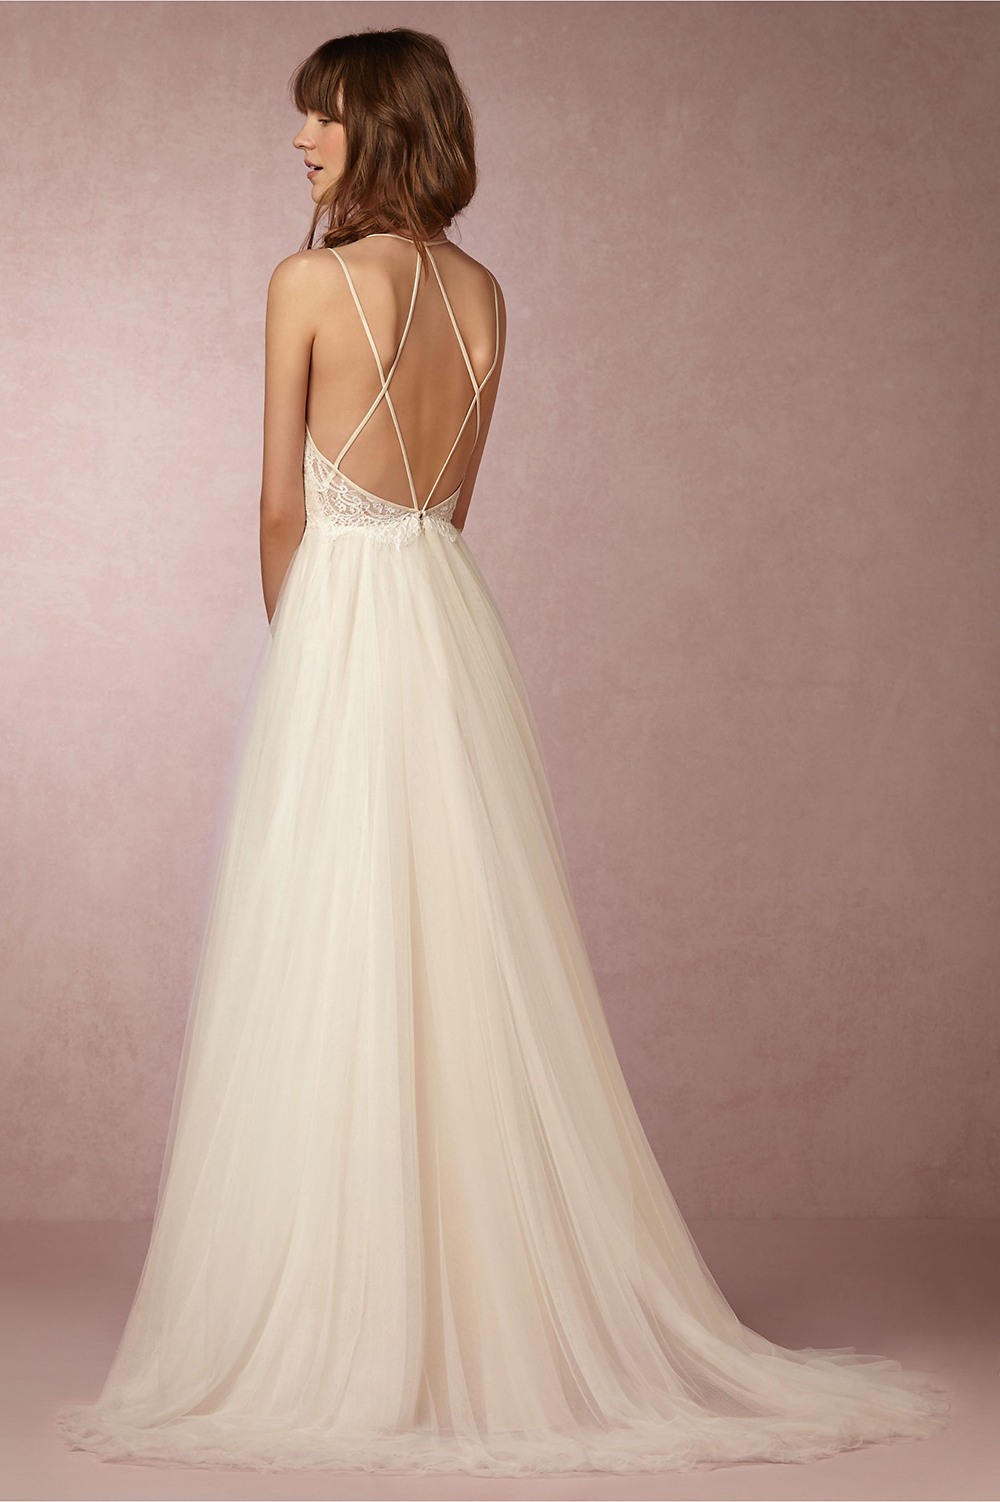 BHLDN Rosalind Gown - BHLDN Wedding Gowns